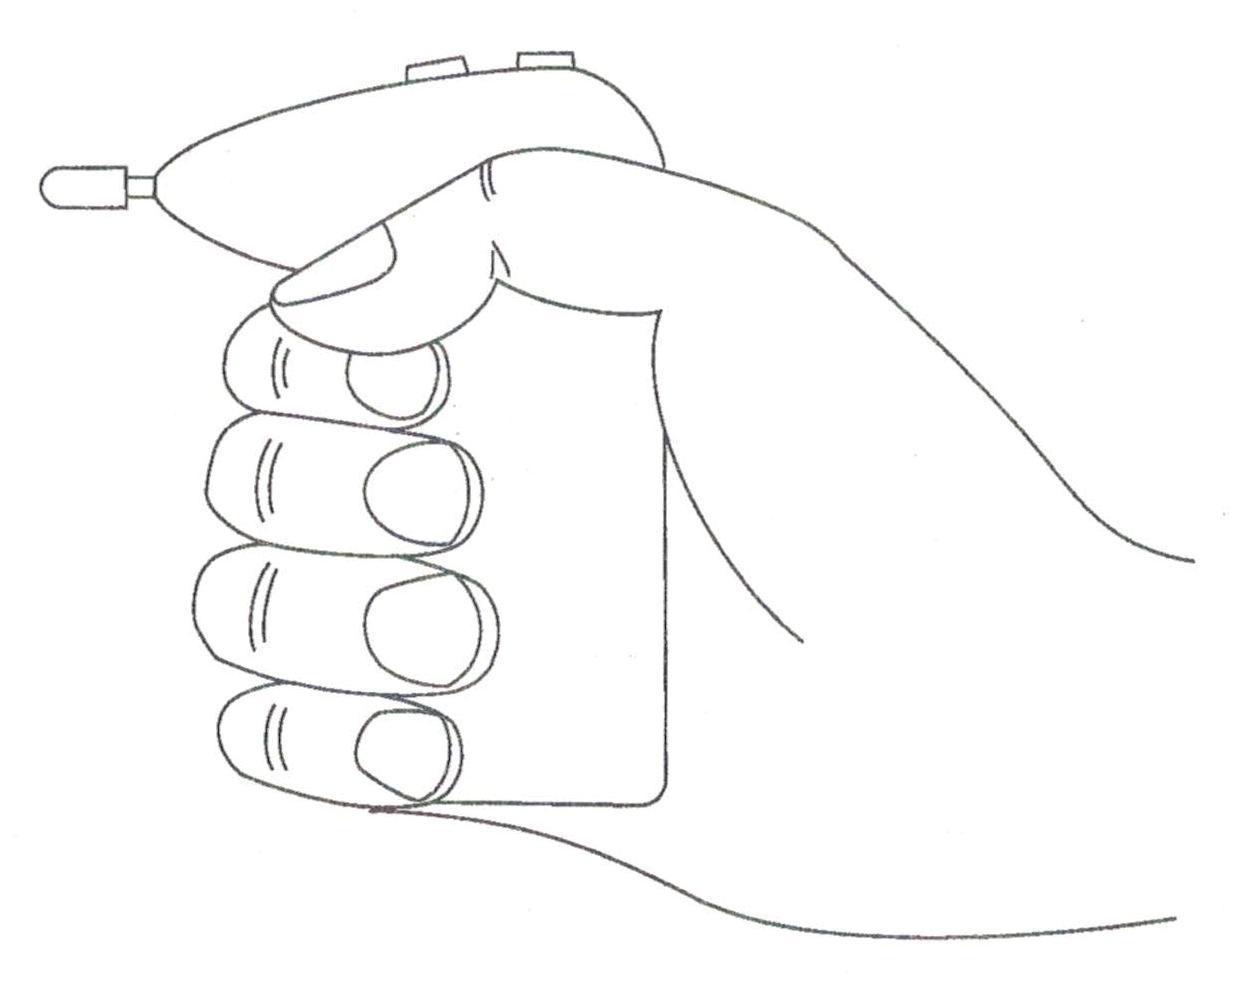 Instructions On Application Of The Vibration Massage Device Su Jok